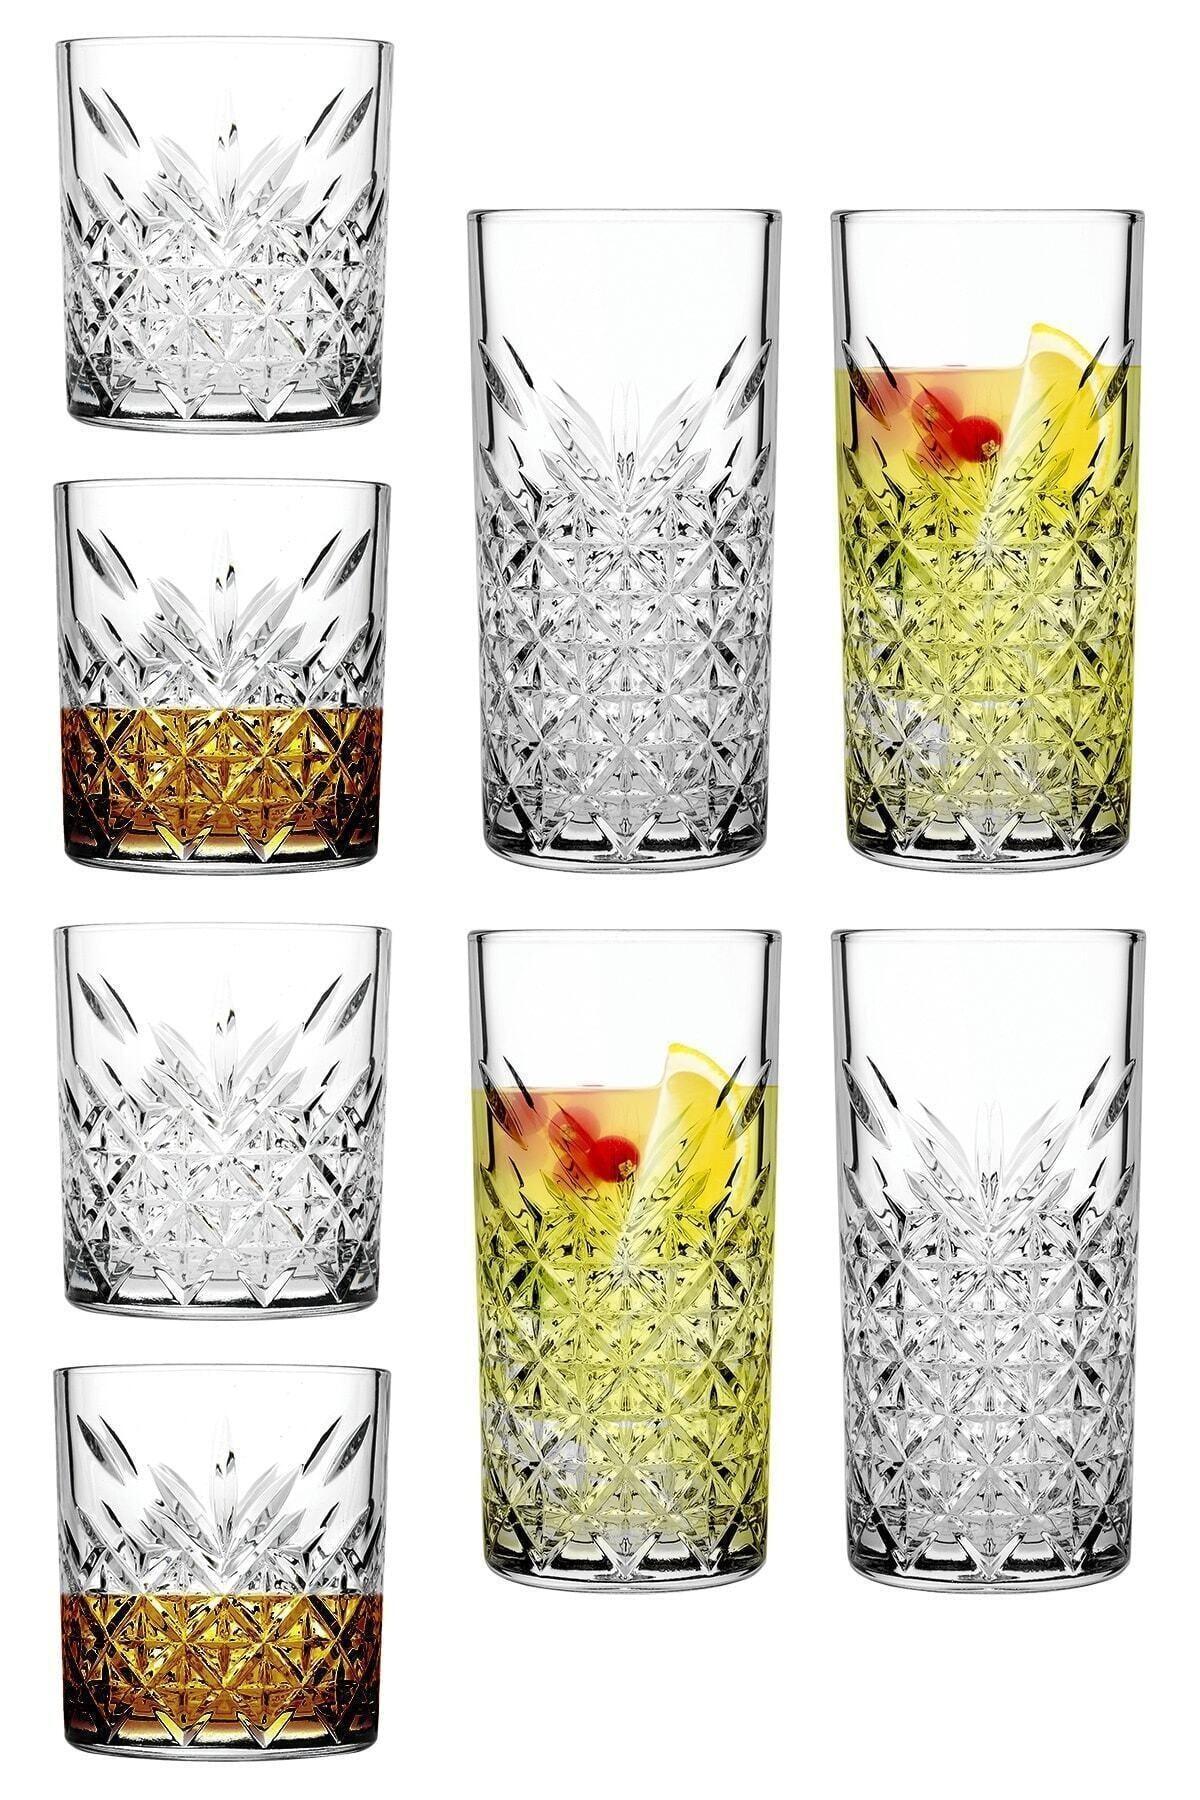 8 Parça Tımeless Viski Ve Kokteyl Keyfi Seti